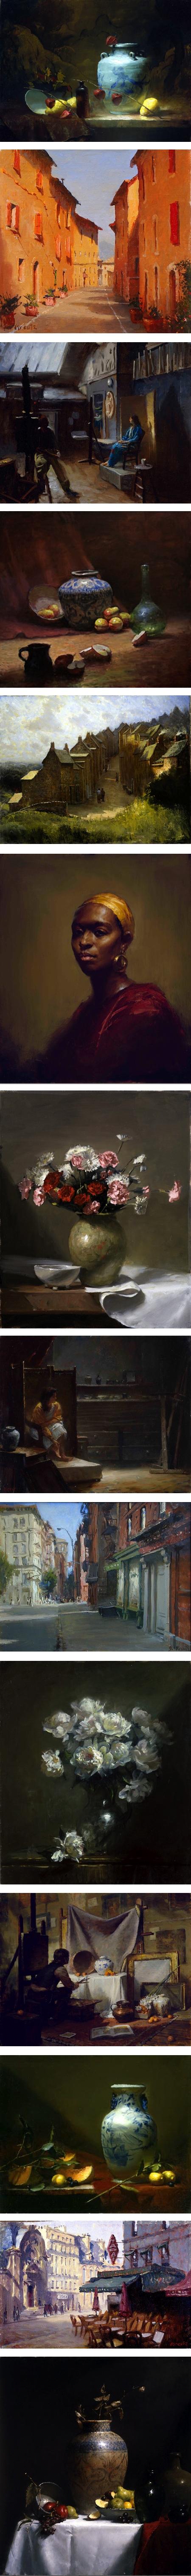 Gregg Kreutz, Problem Solving for Oil Painters